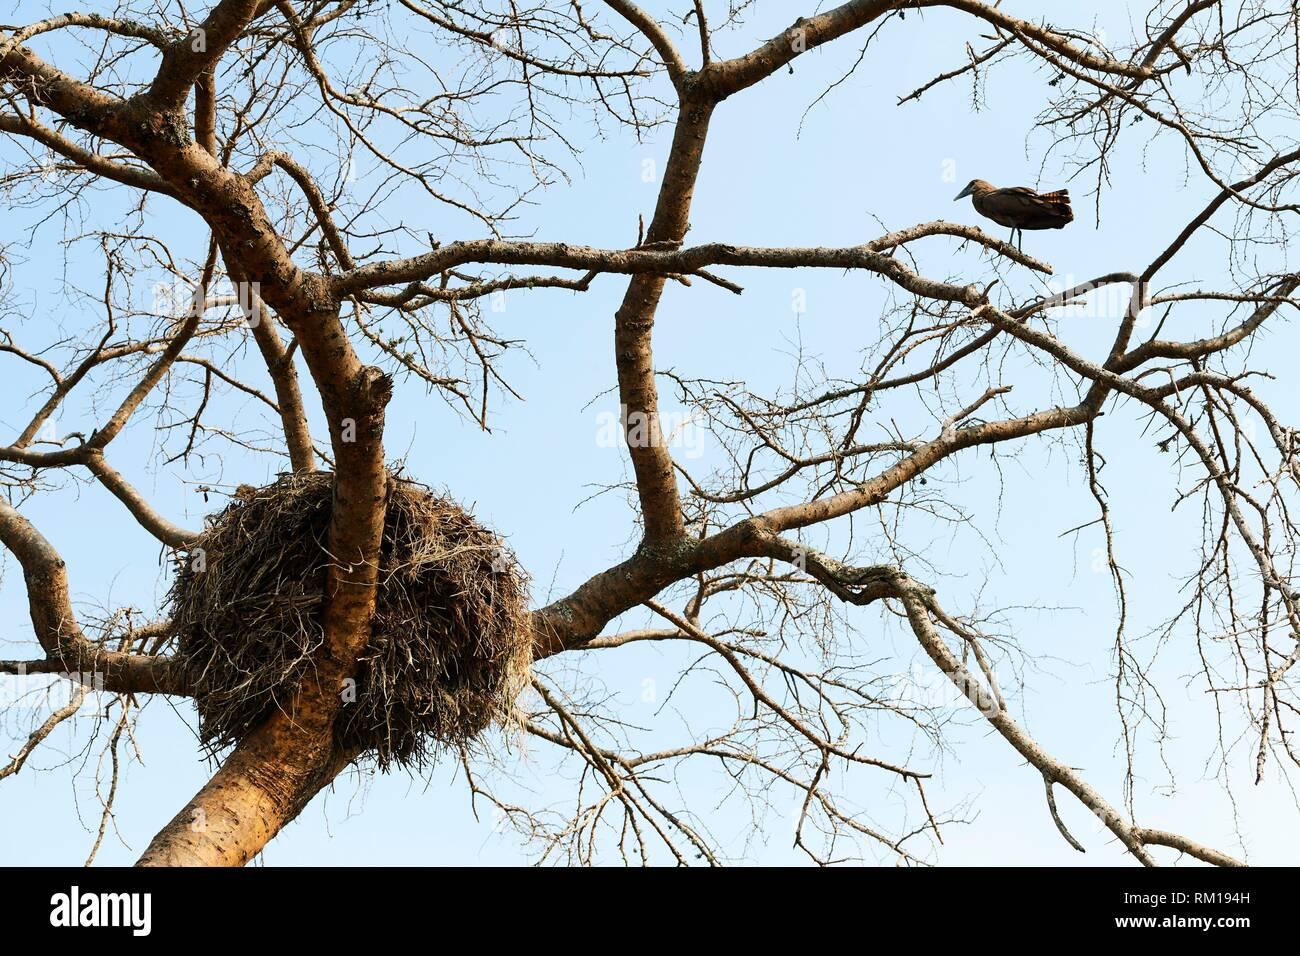 Hamerkop (Scopus umbretta) appollaiato sul ramo vicino al suo nido. Queen Elizabeth National Park, Uganda, Africa. Immagini Stock